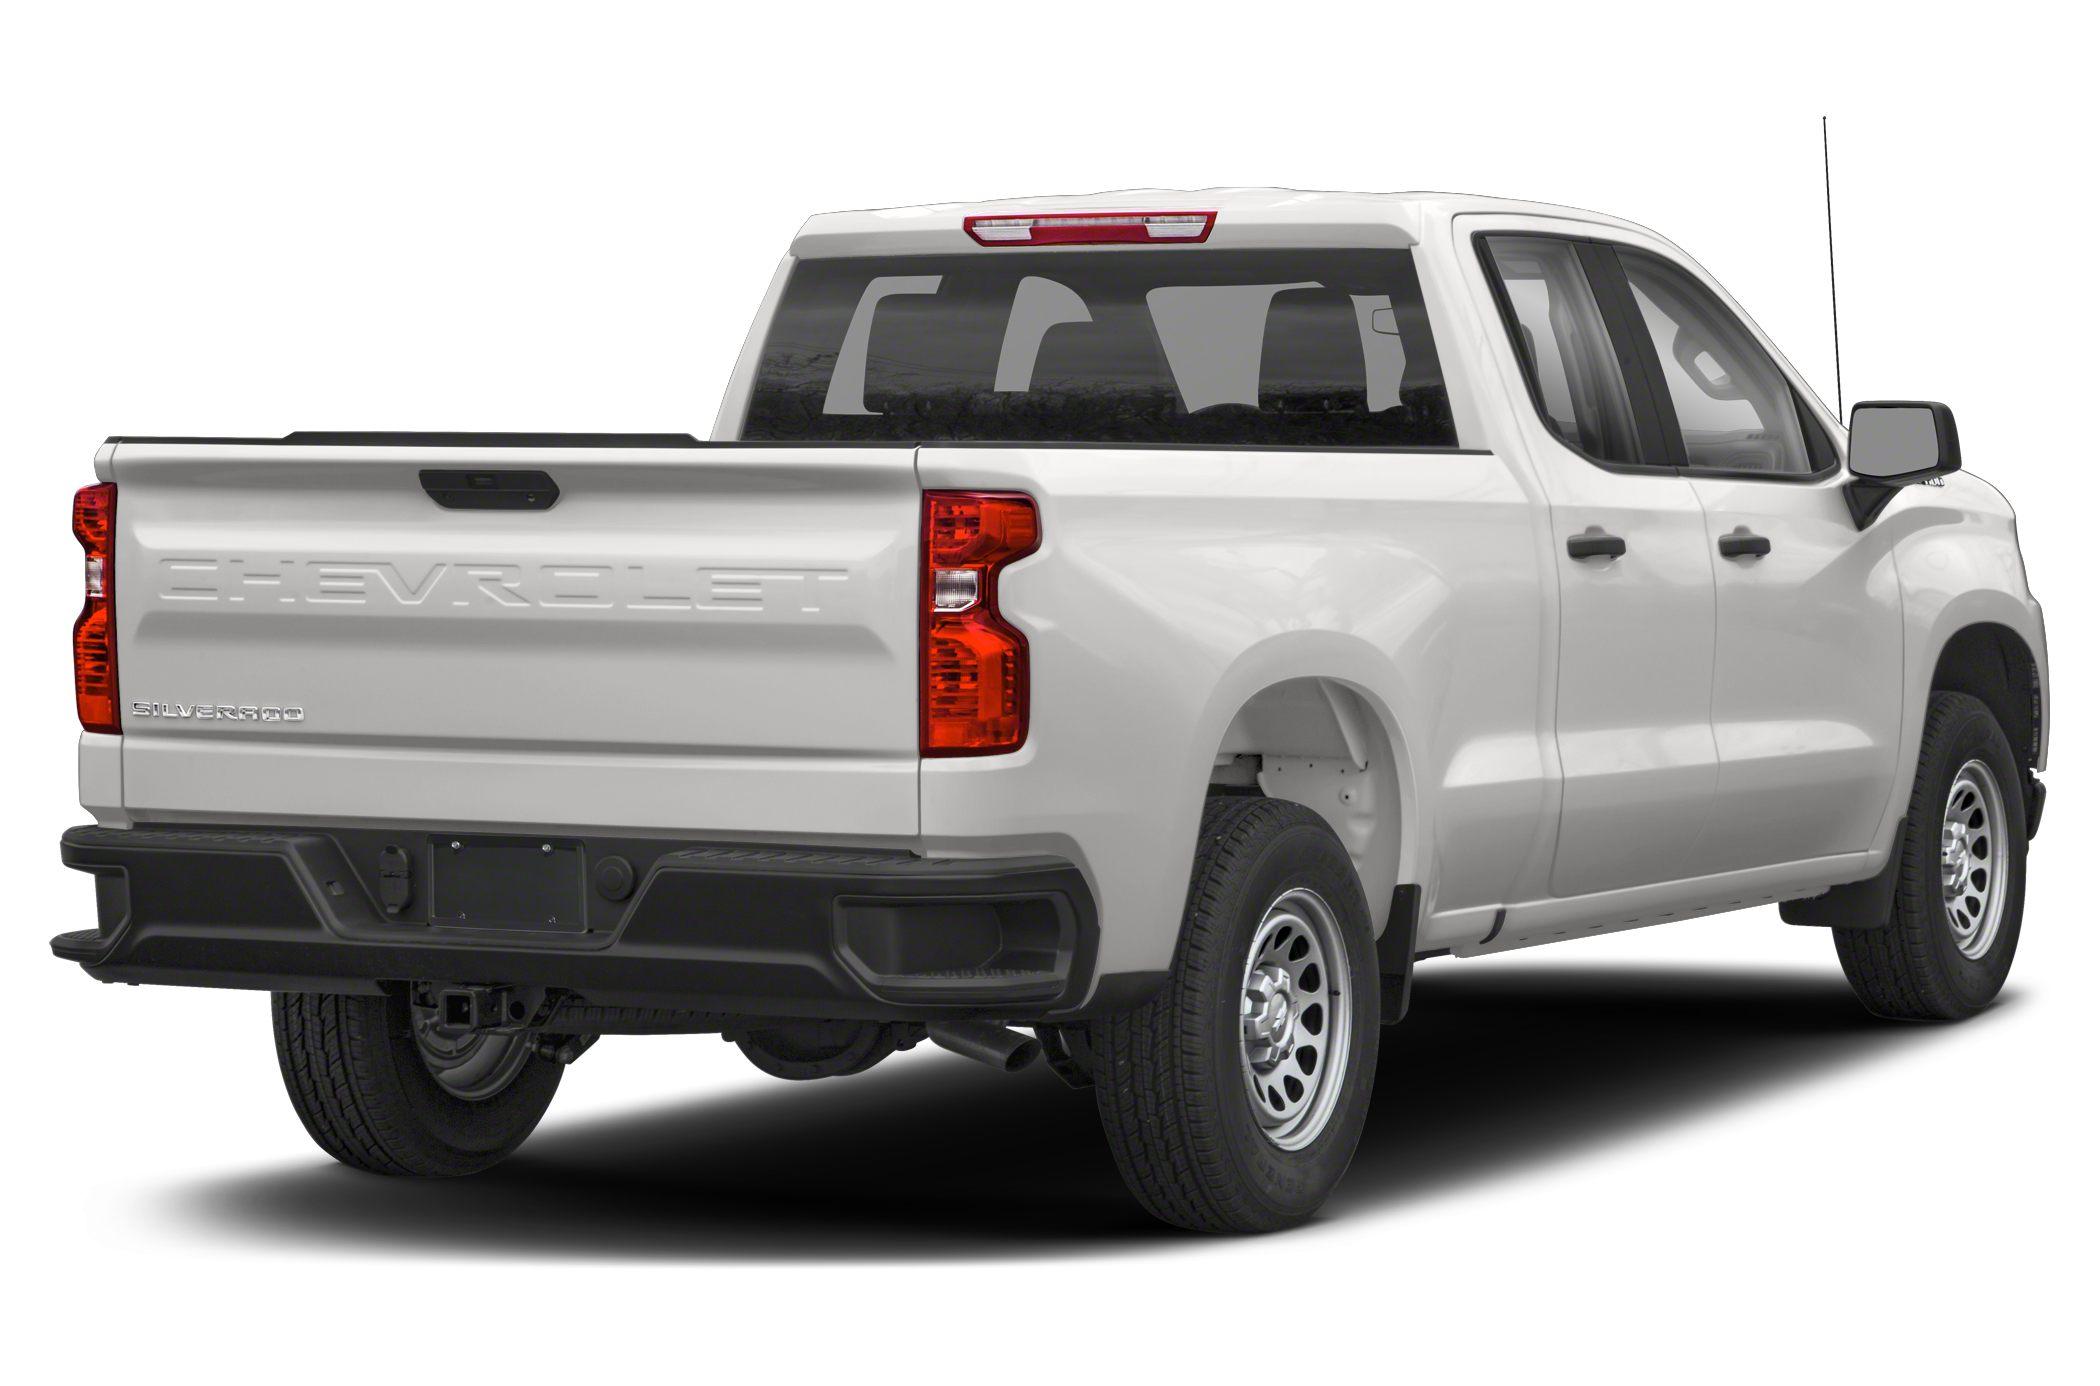 2019 Chevrolet Silverado 1500 Deals Prices Incentives Leases